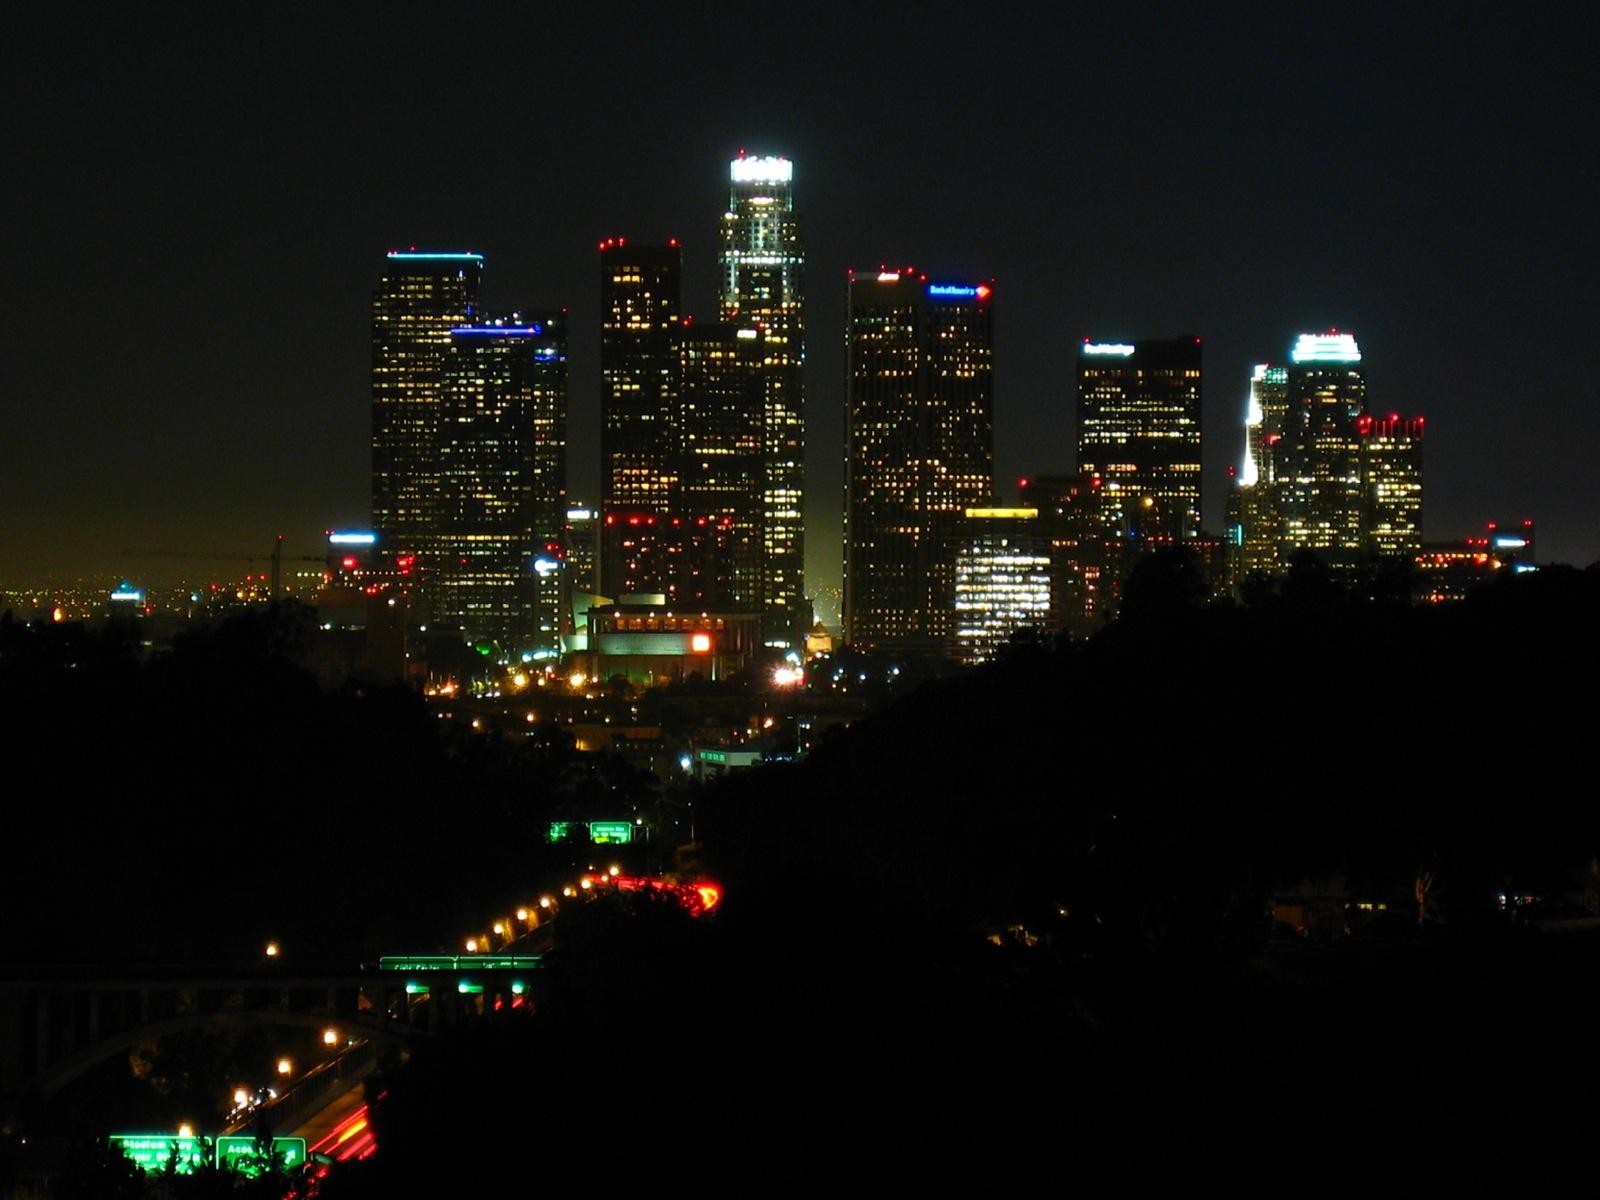 downtownskyline.jpg